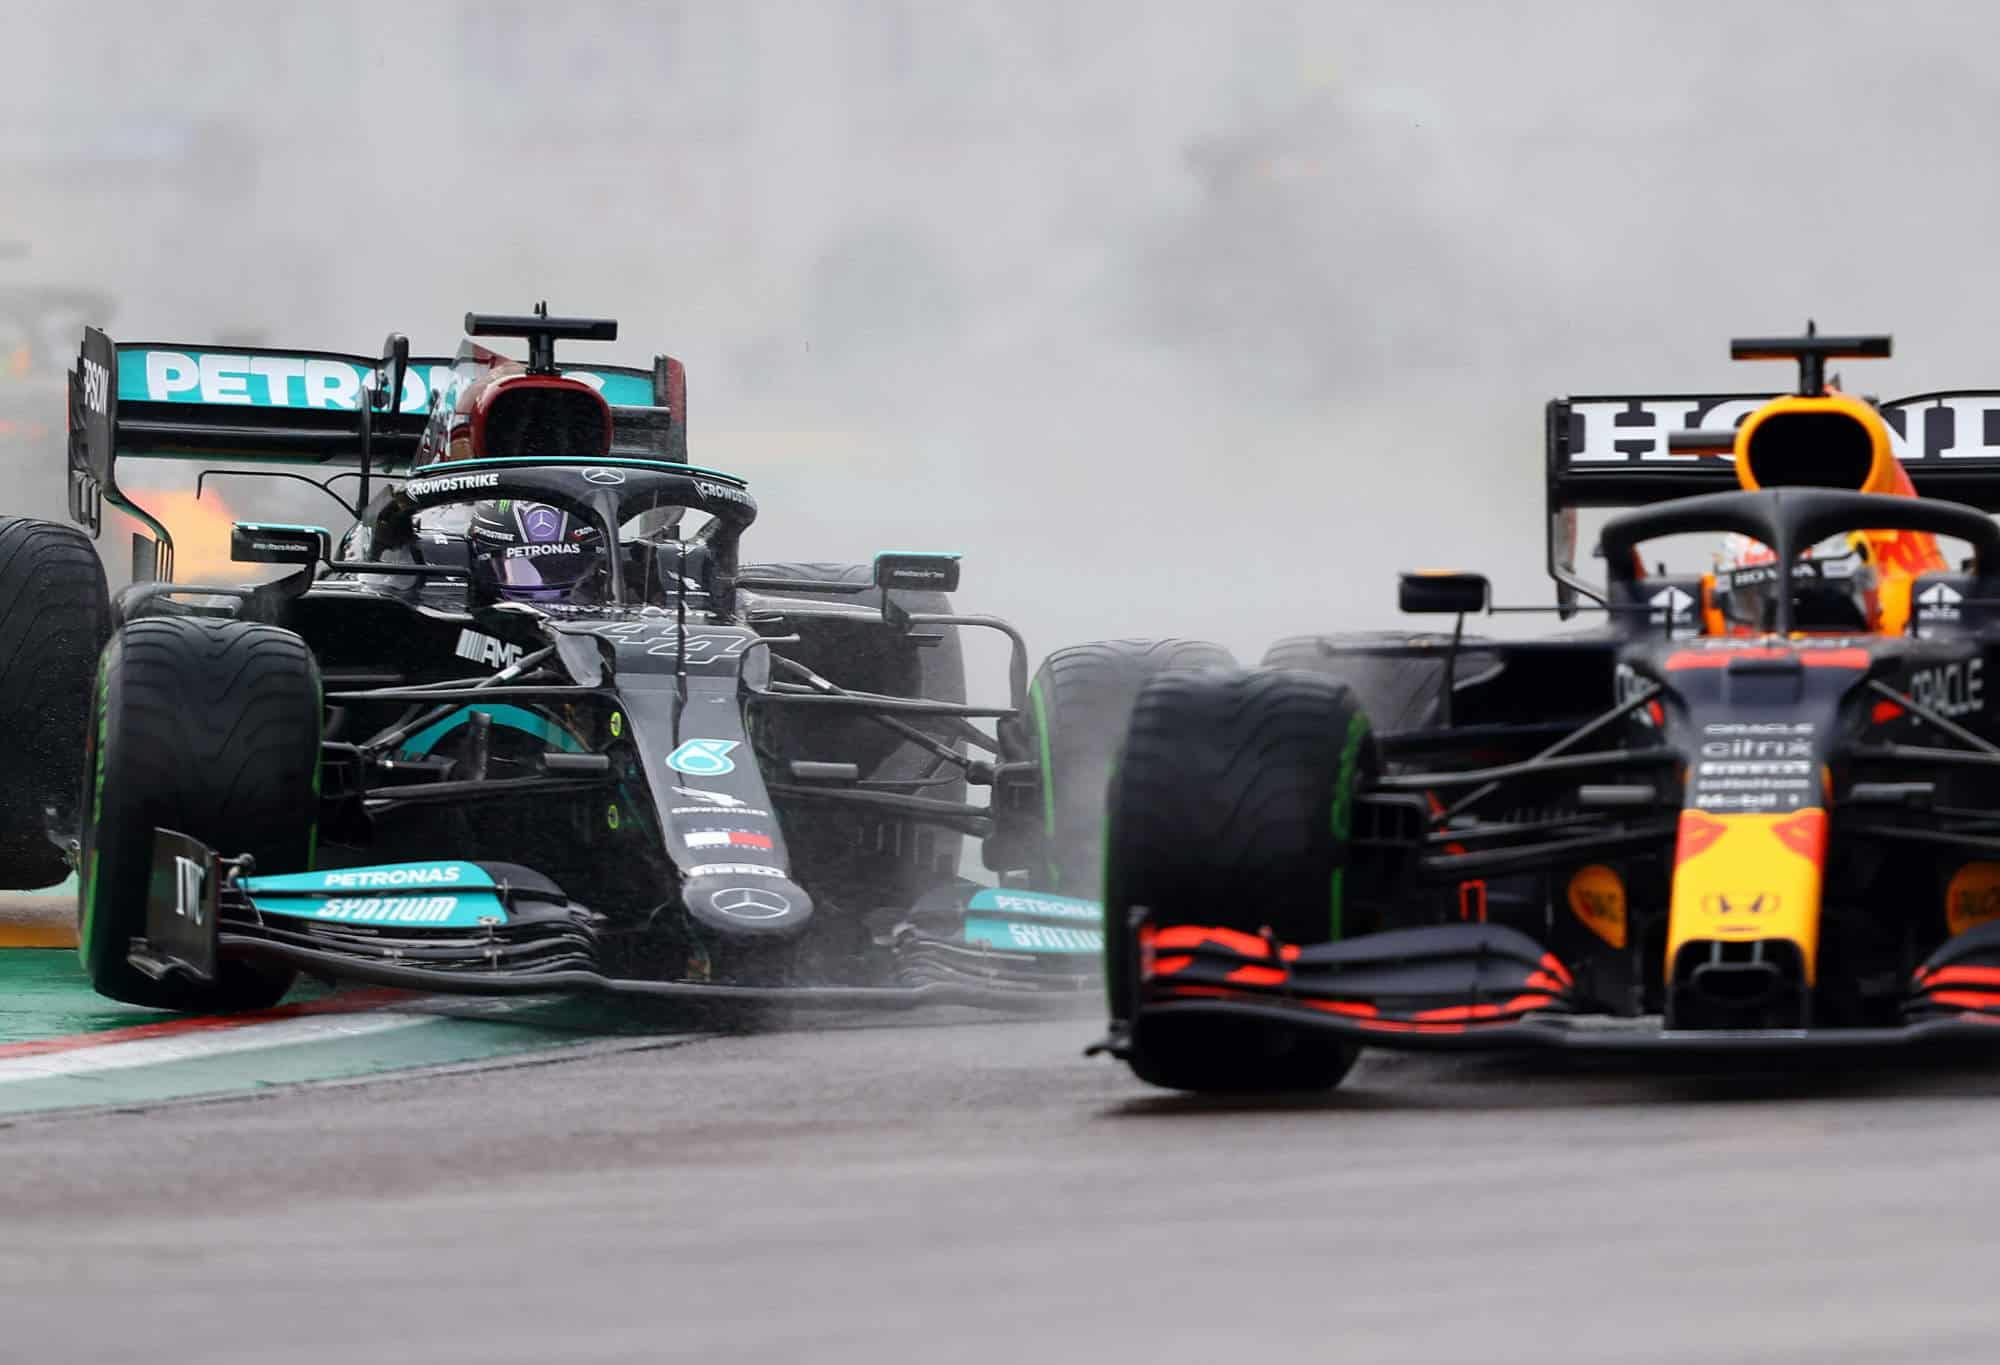 2021 Emilia Romagna GP Verstappen vs Hamilton first lap battle close zoom Photo Red Bull